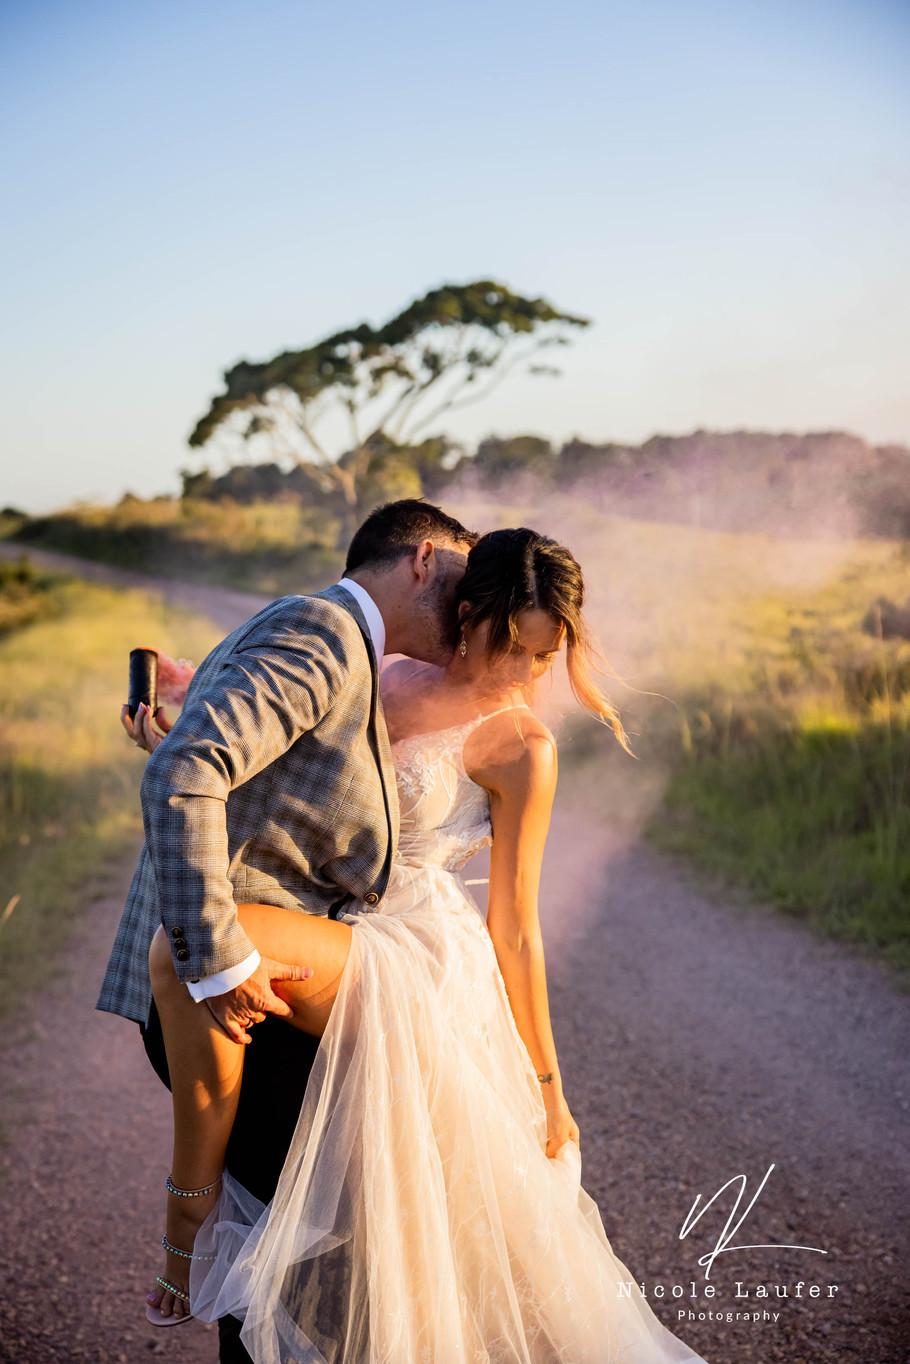 Bonnie and Tim | Weddings at Tiffany's